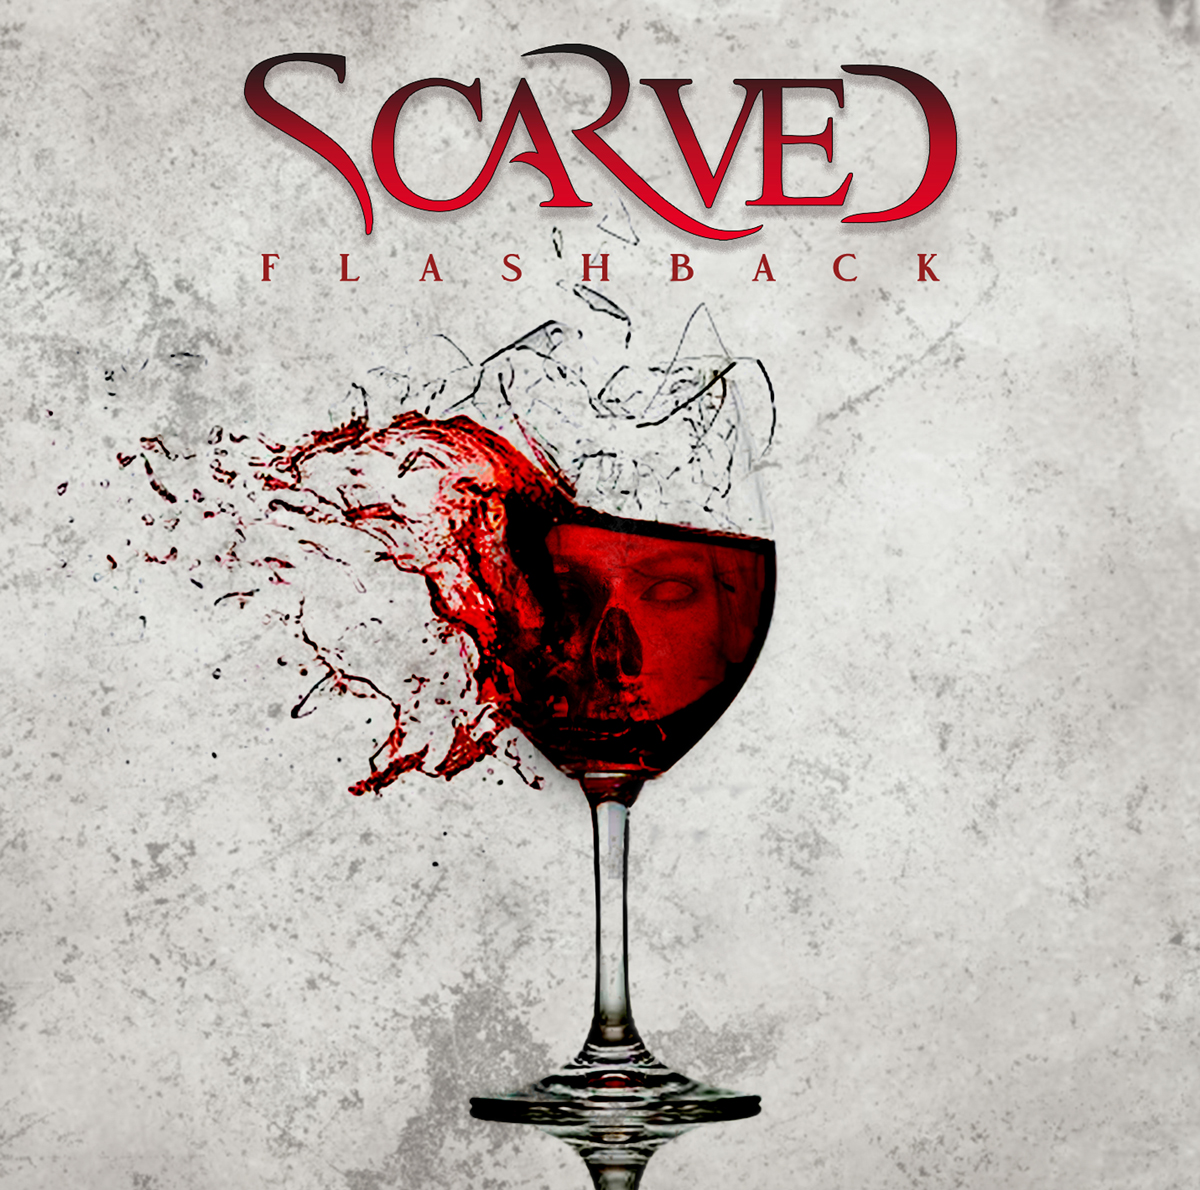 SCARVED - album